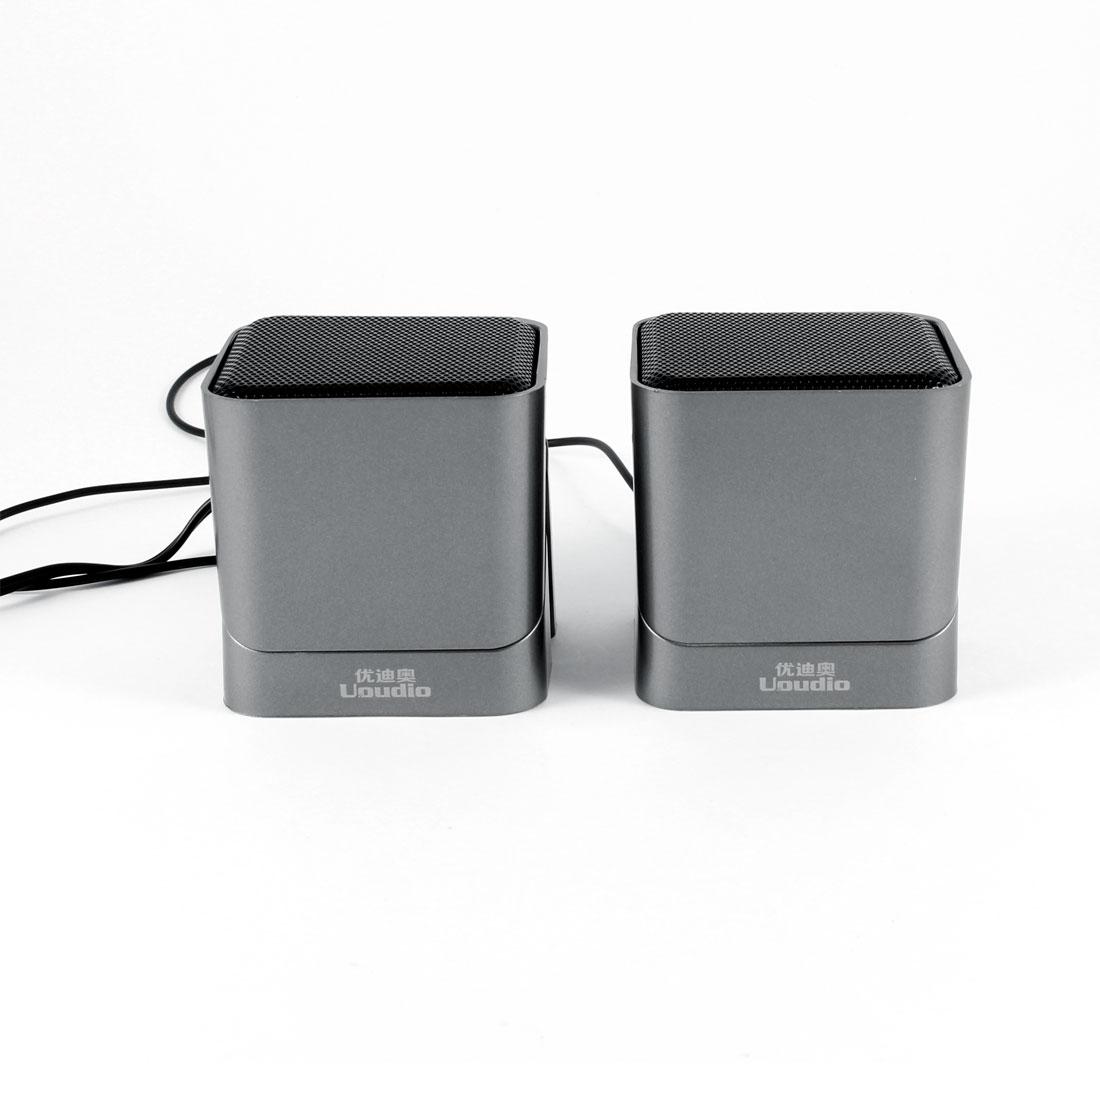 Silver Tone Volume Control USB 2.0 Desktop Mini Speaker Box Pair for MP4 PC Computer